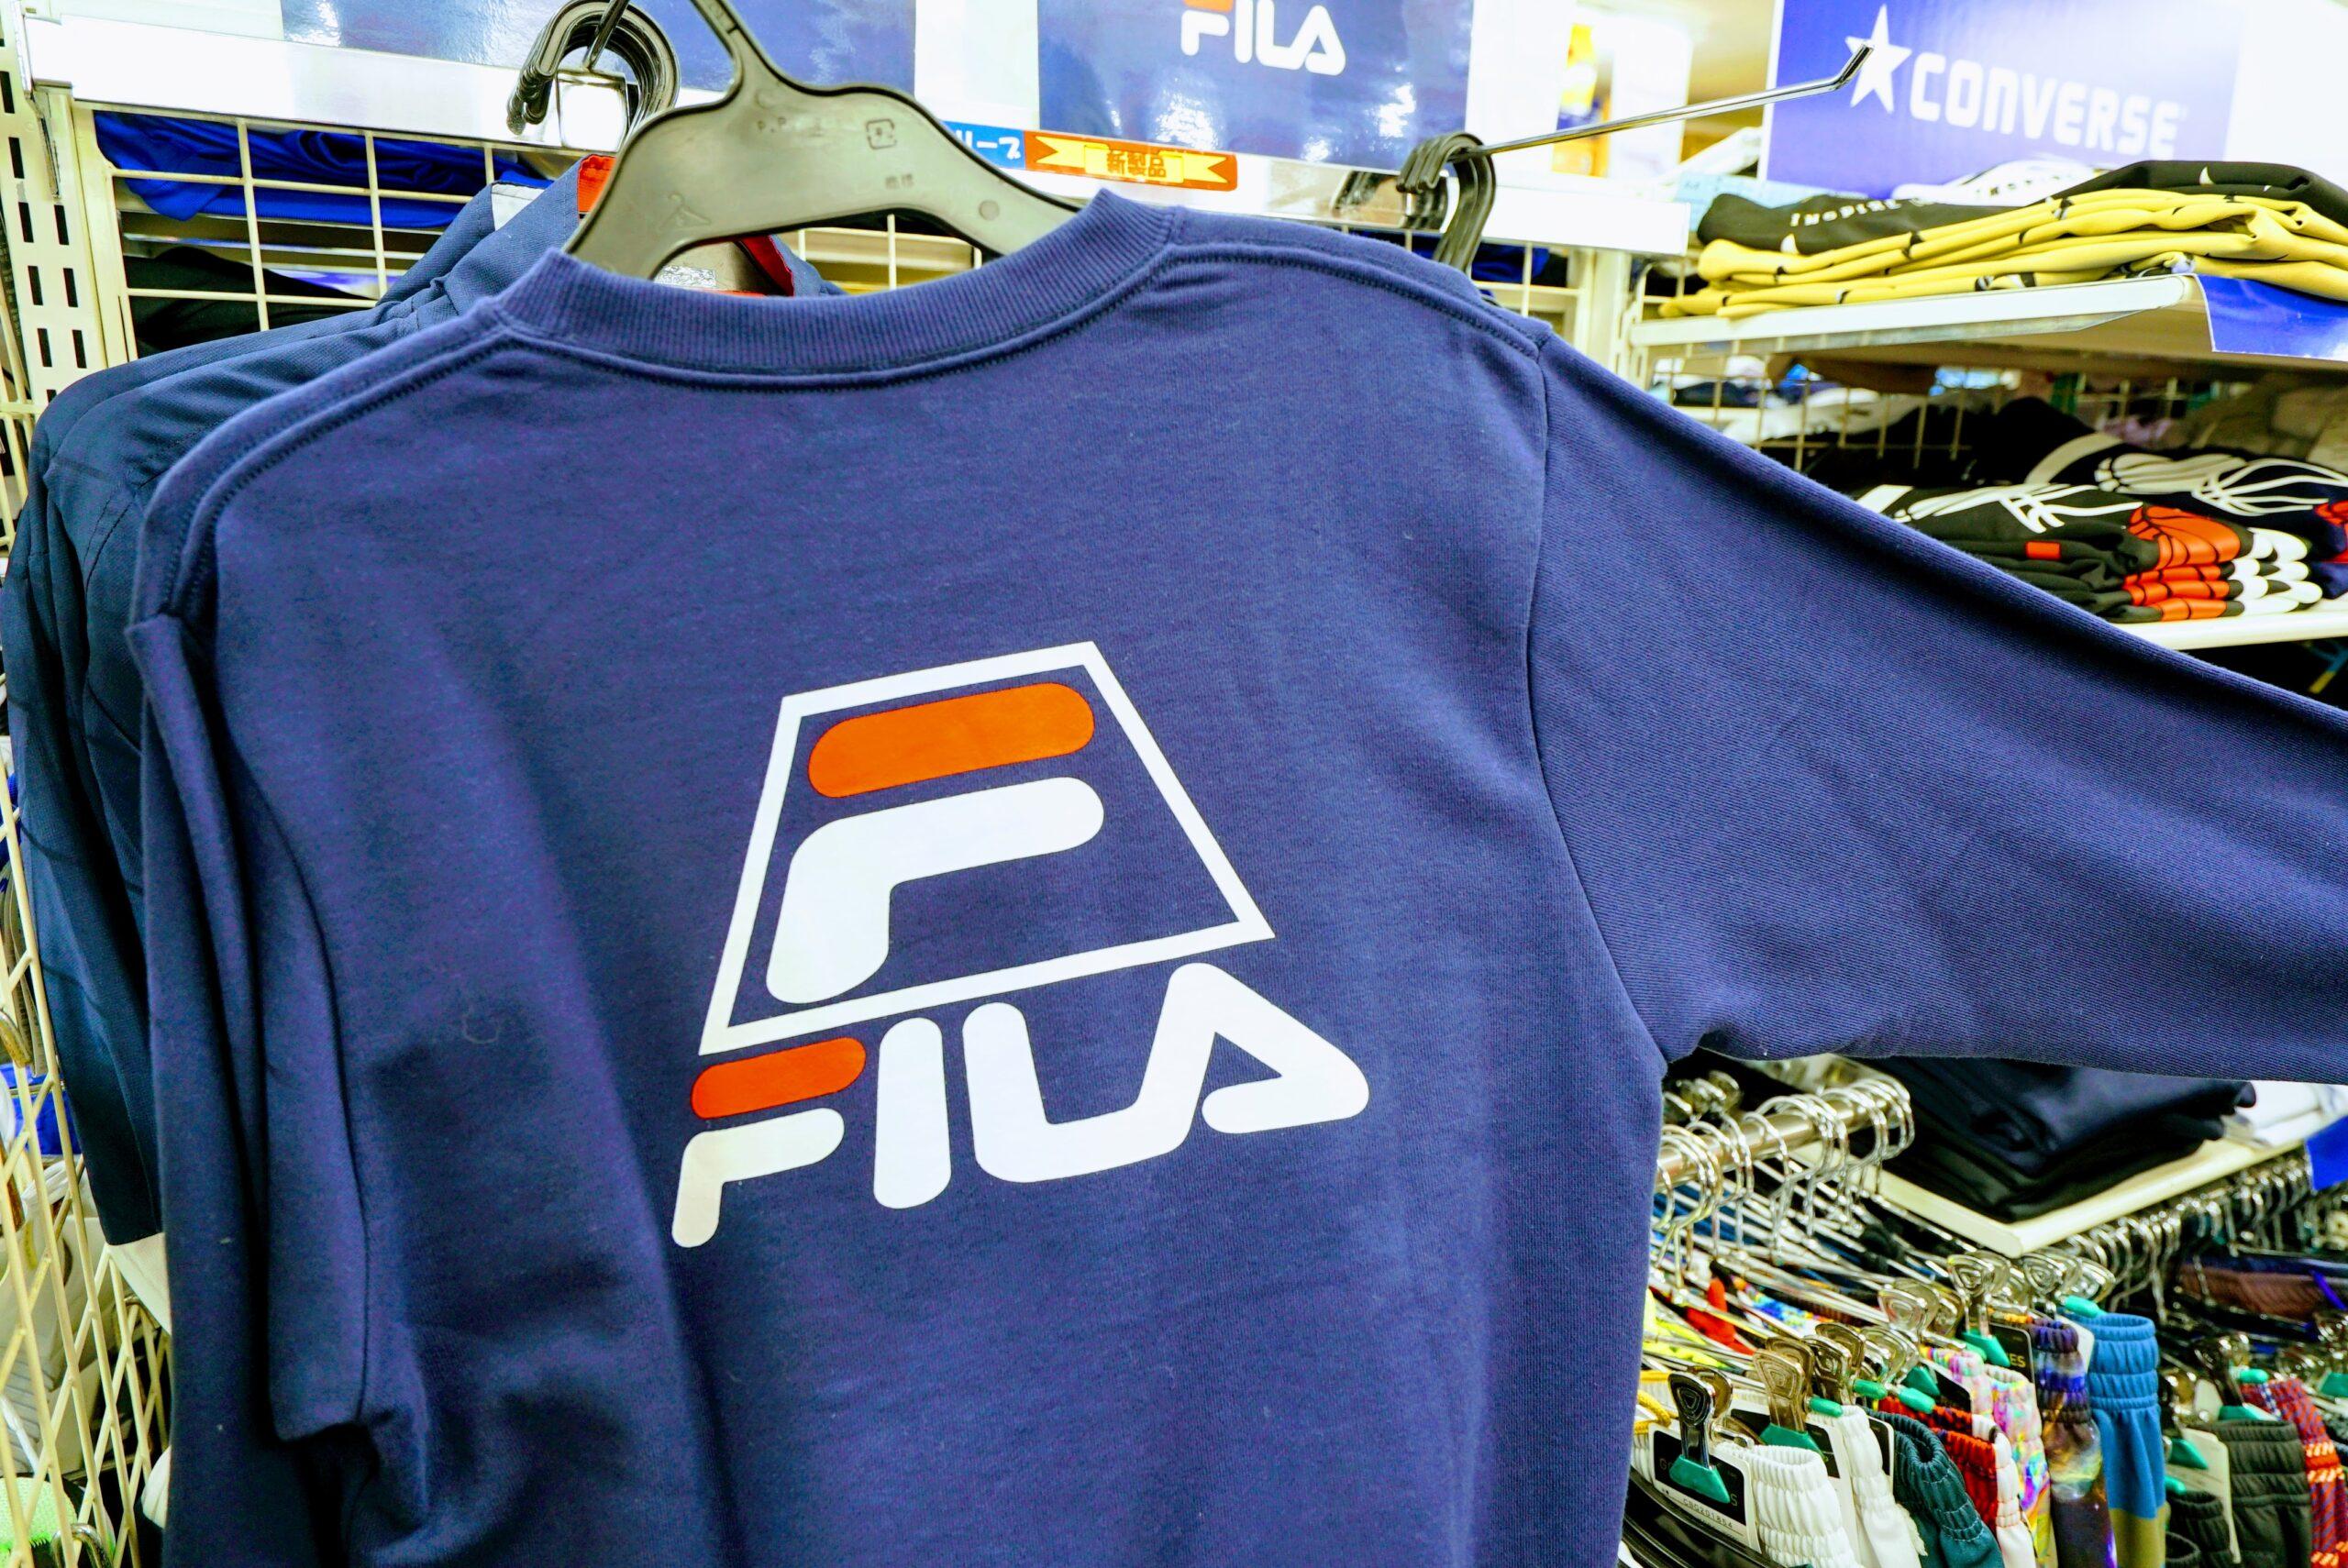 FILAスポーツウェア ロングTシャツ